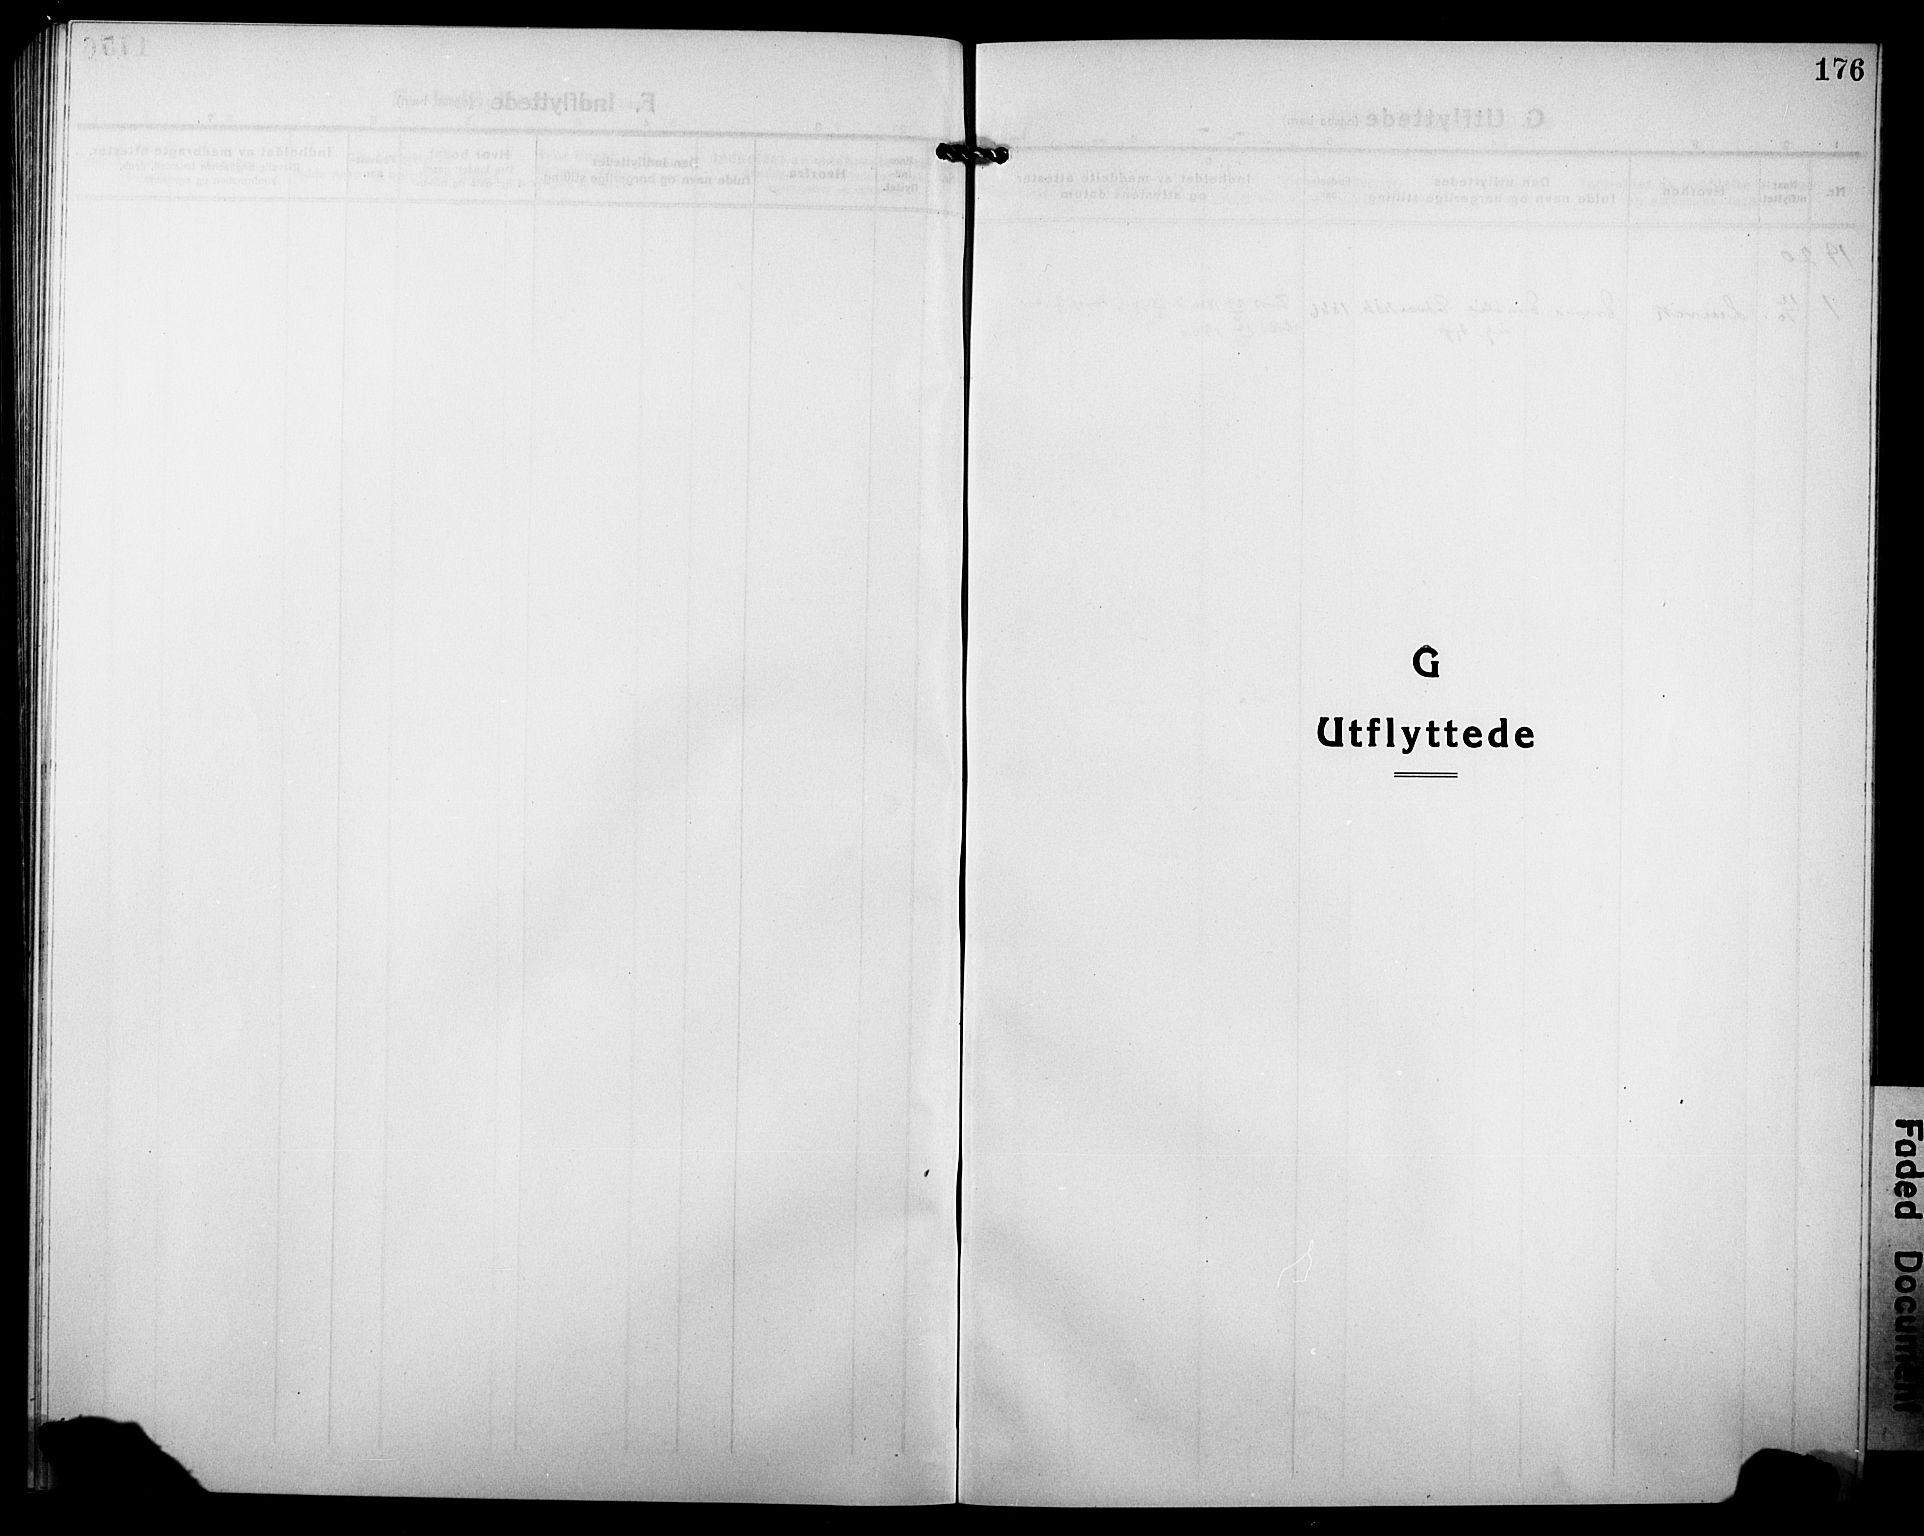 SATØ, Tranøy sokneprestkontor, I/Ia/Iab/L0006klokker: Klokkerbok nr. 6, 1919-1932, s. 176